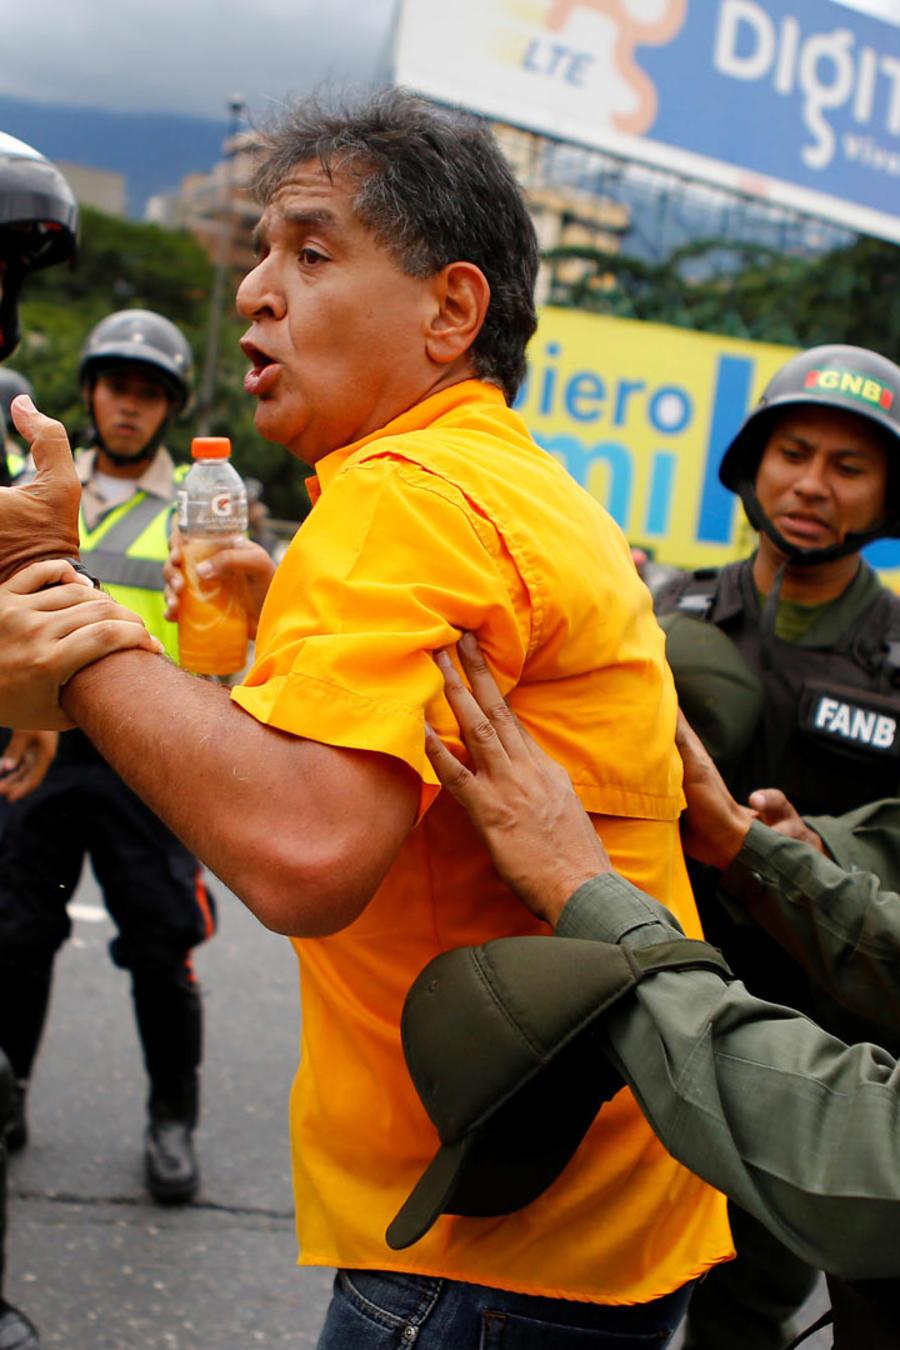 policia y manifestante venezolano